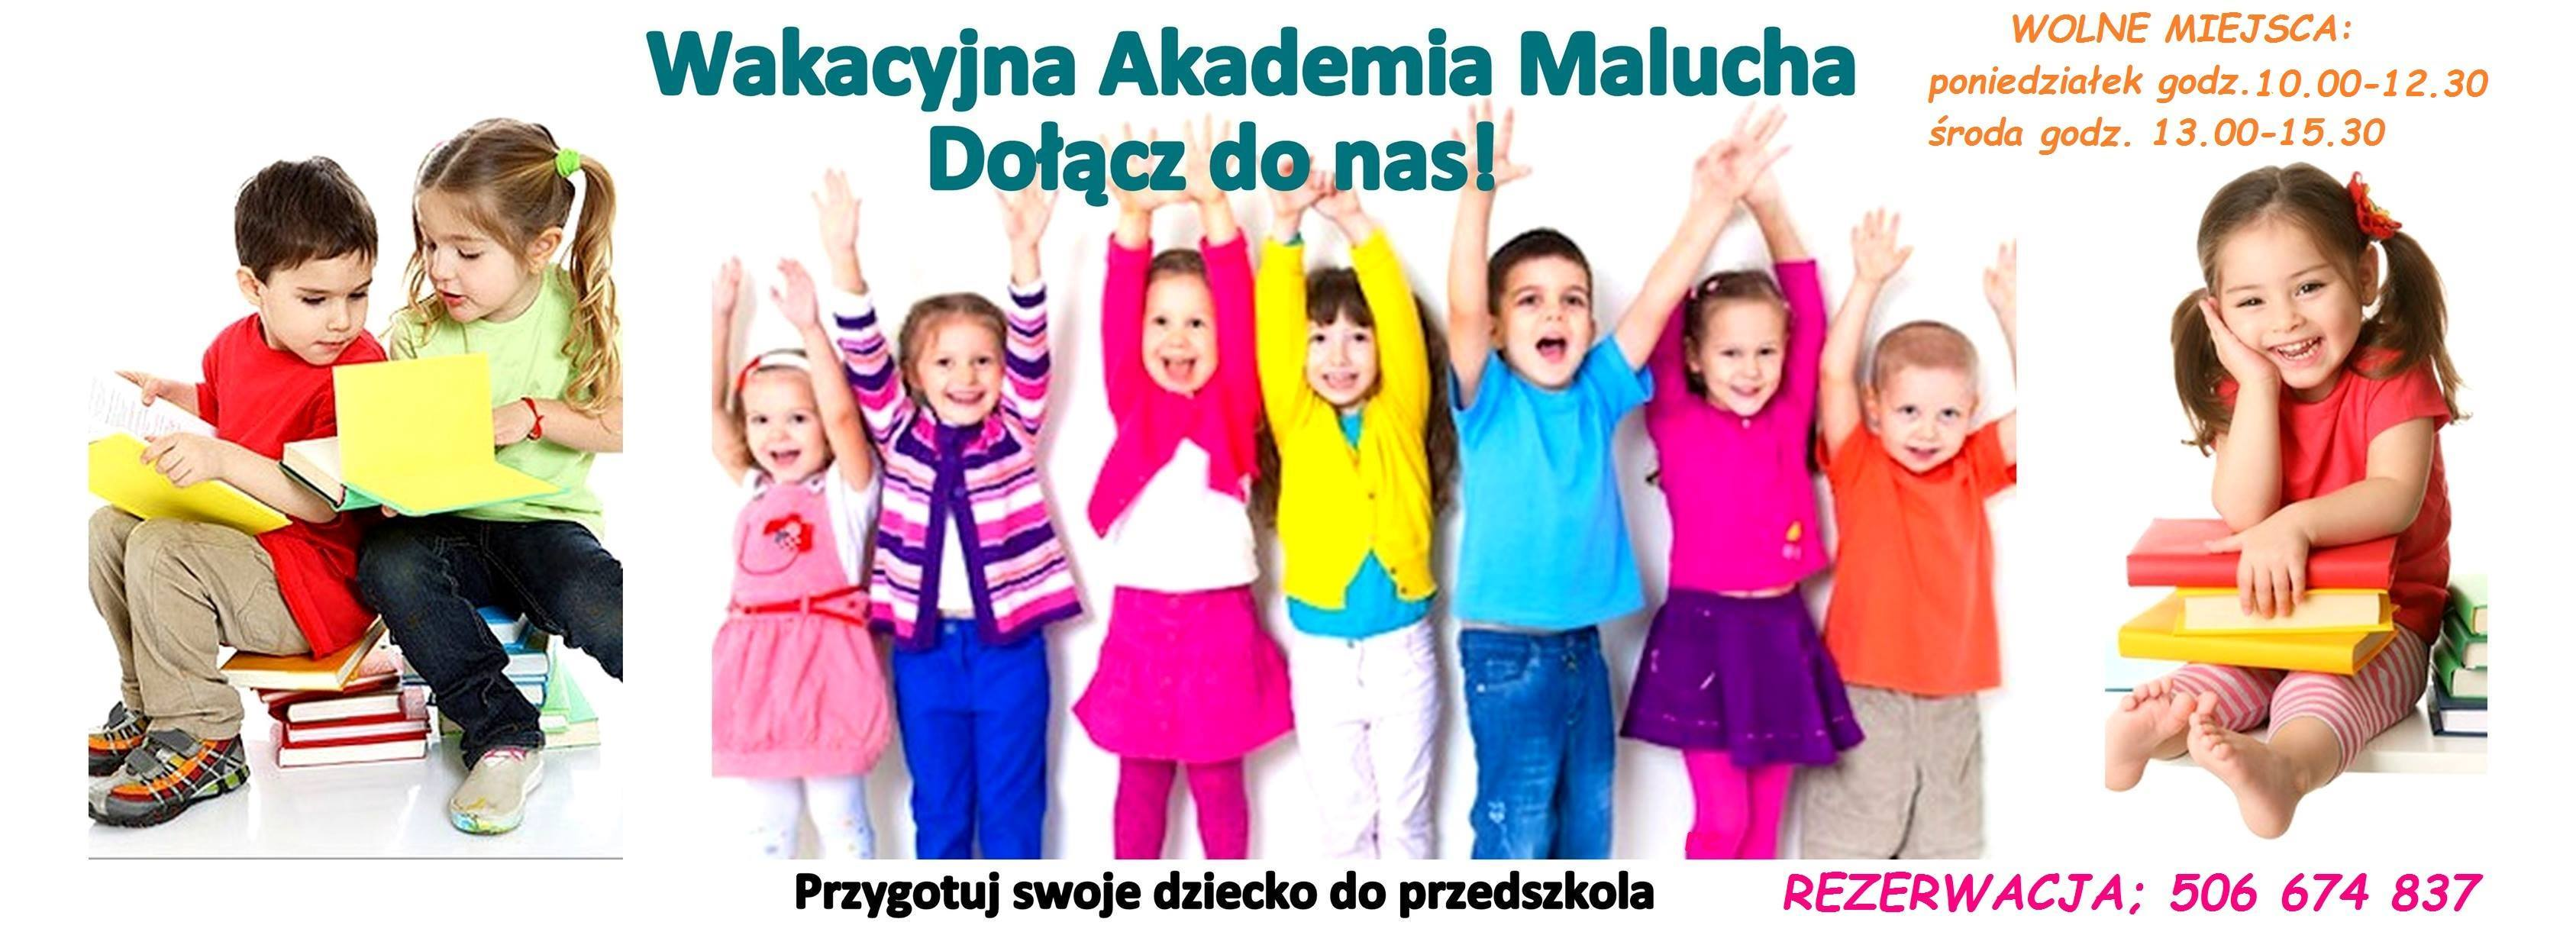 bcc Akademia Malucha łódź